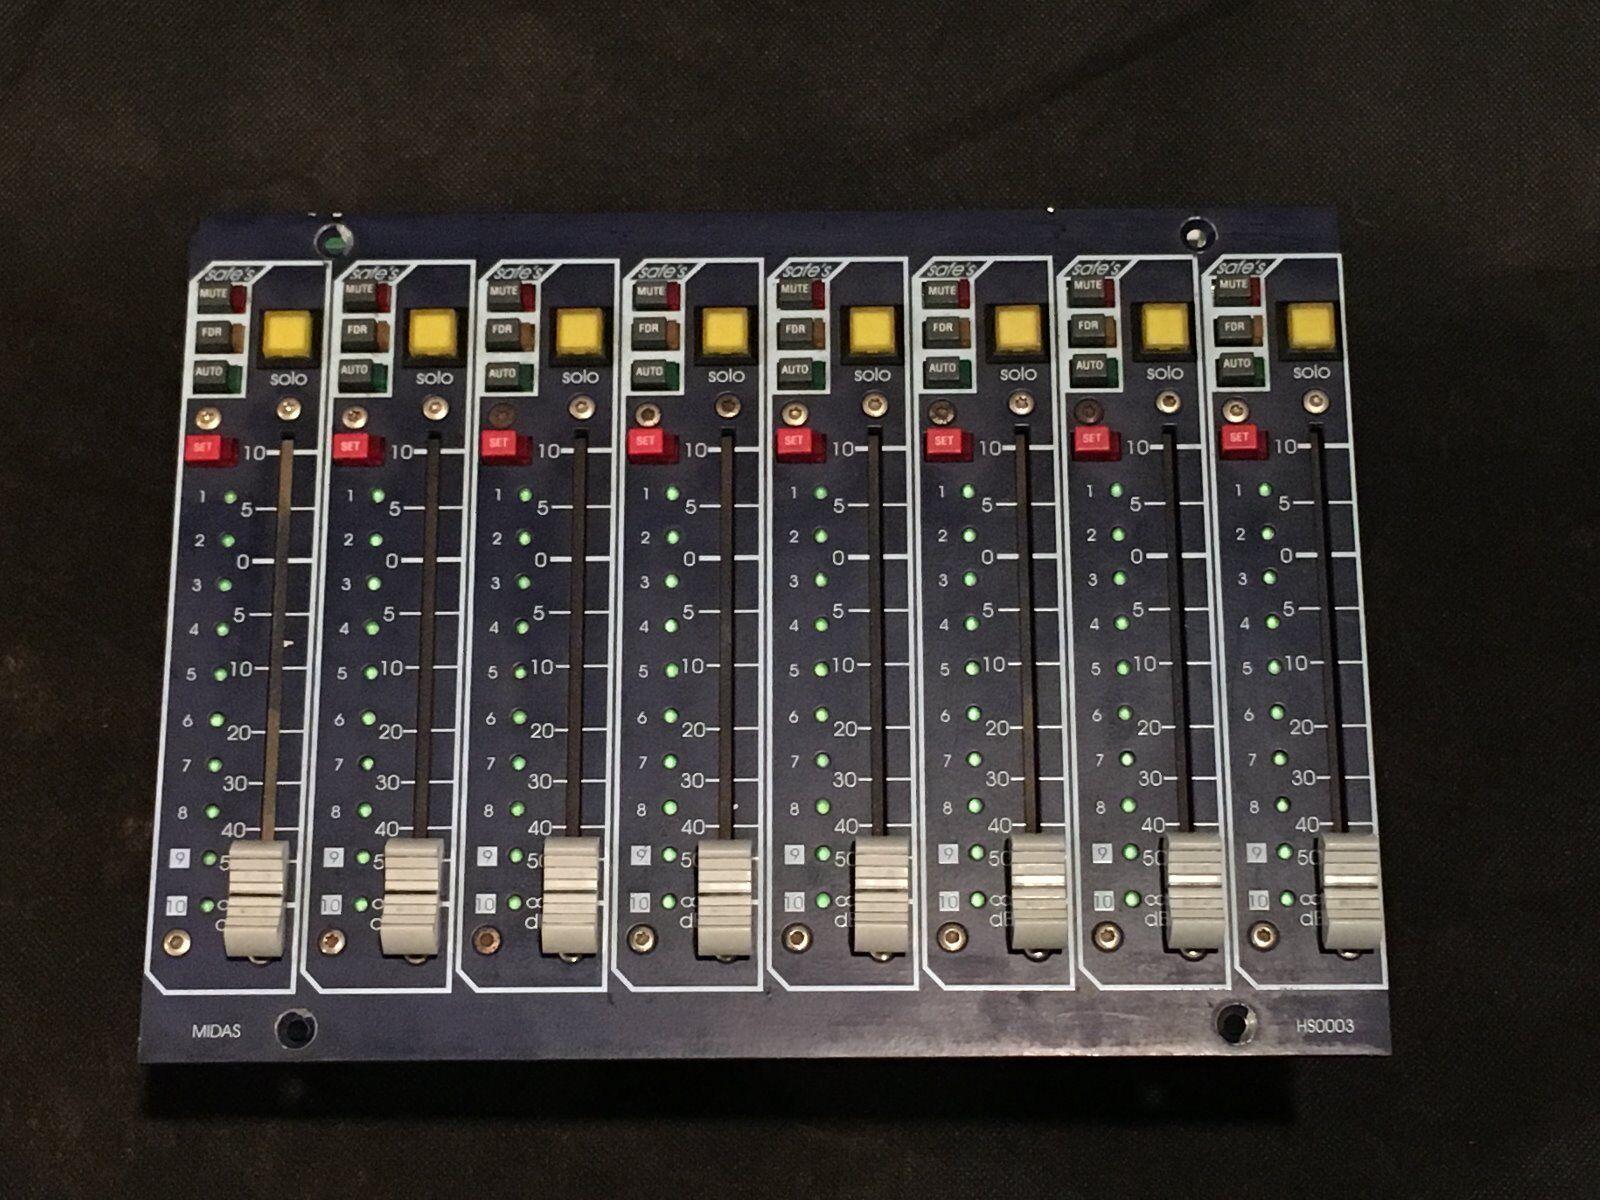 Midas Heritage 3000 ( HS0003) Fader Module